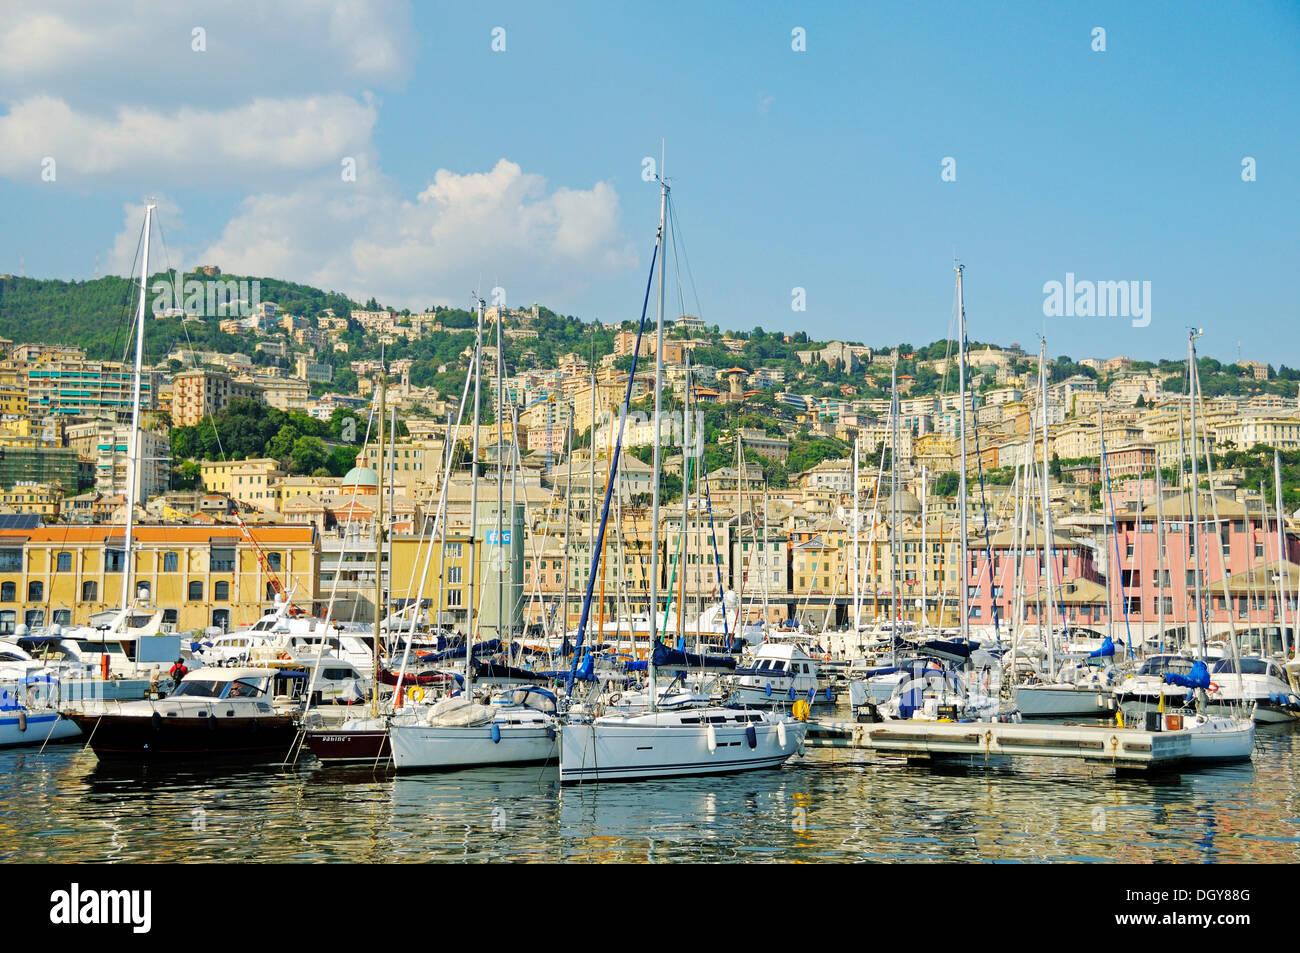 Sailing boats at Porto Antico, the Old Port of Genoa, Liguria, Italy, Europe - Stock Image